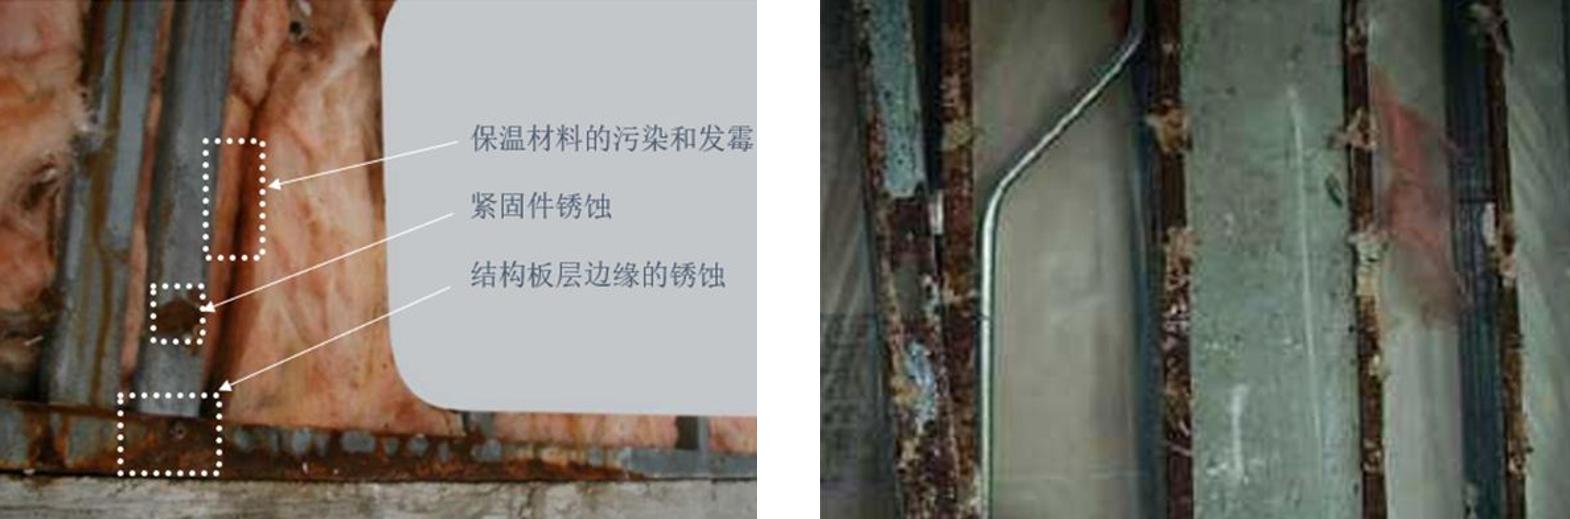 Image Component